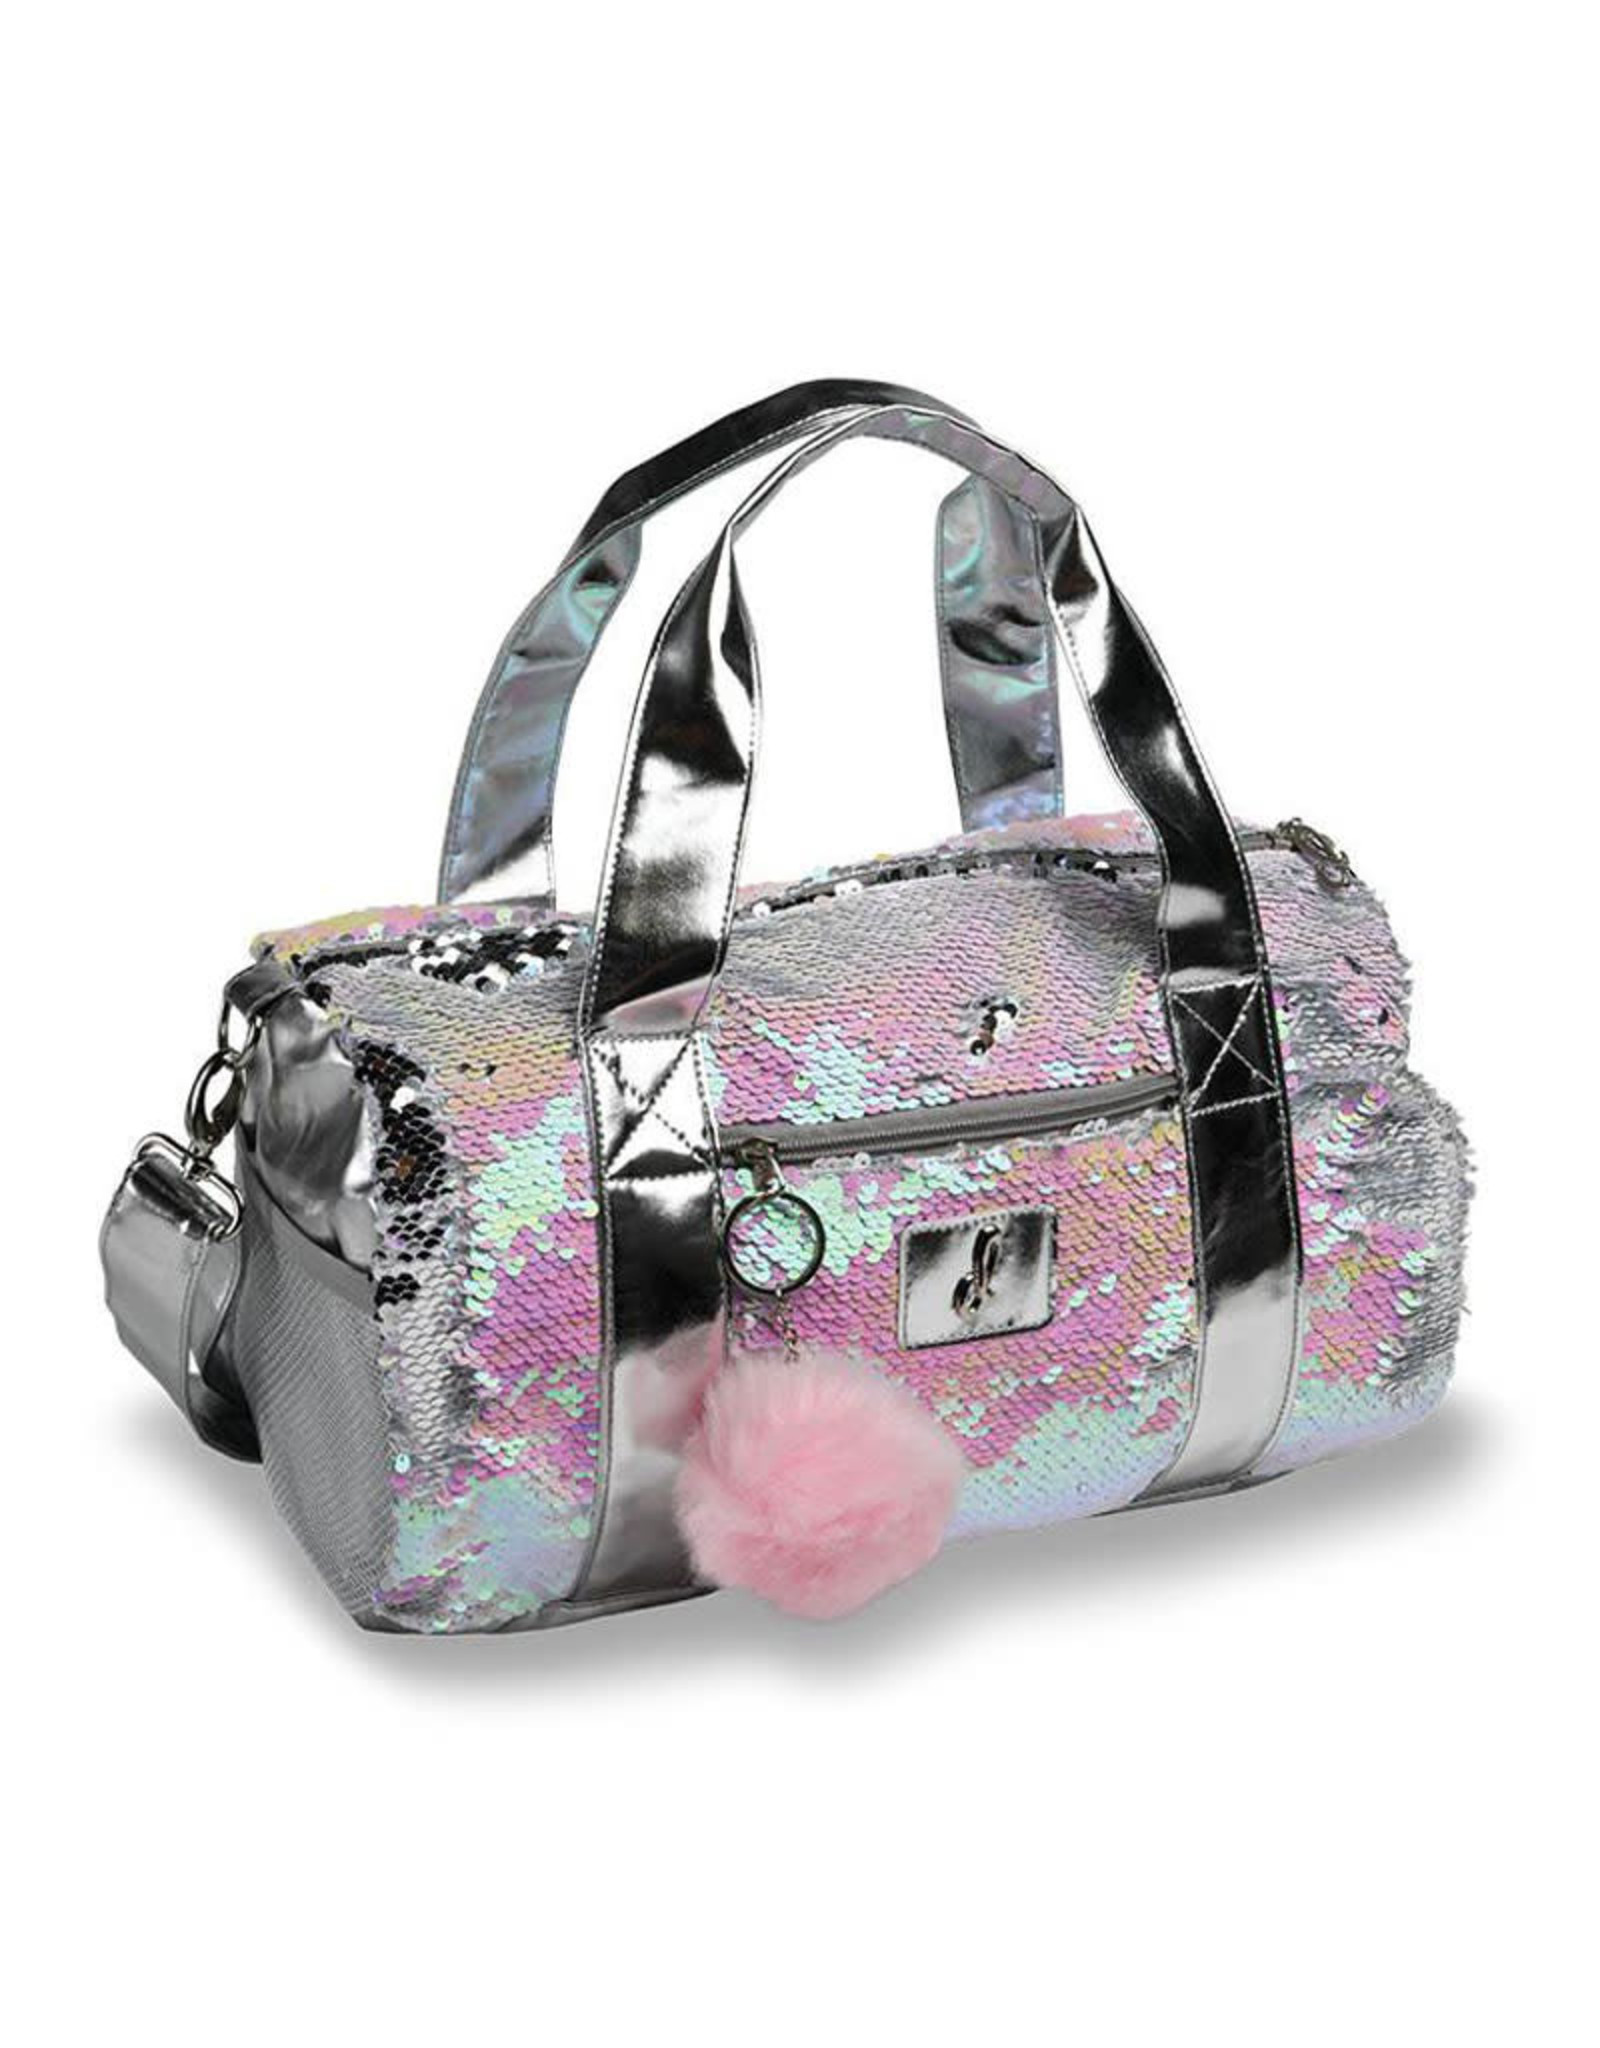 Danshuz sac style B837